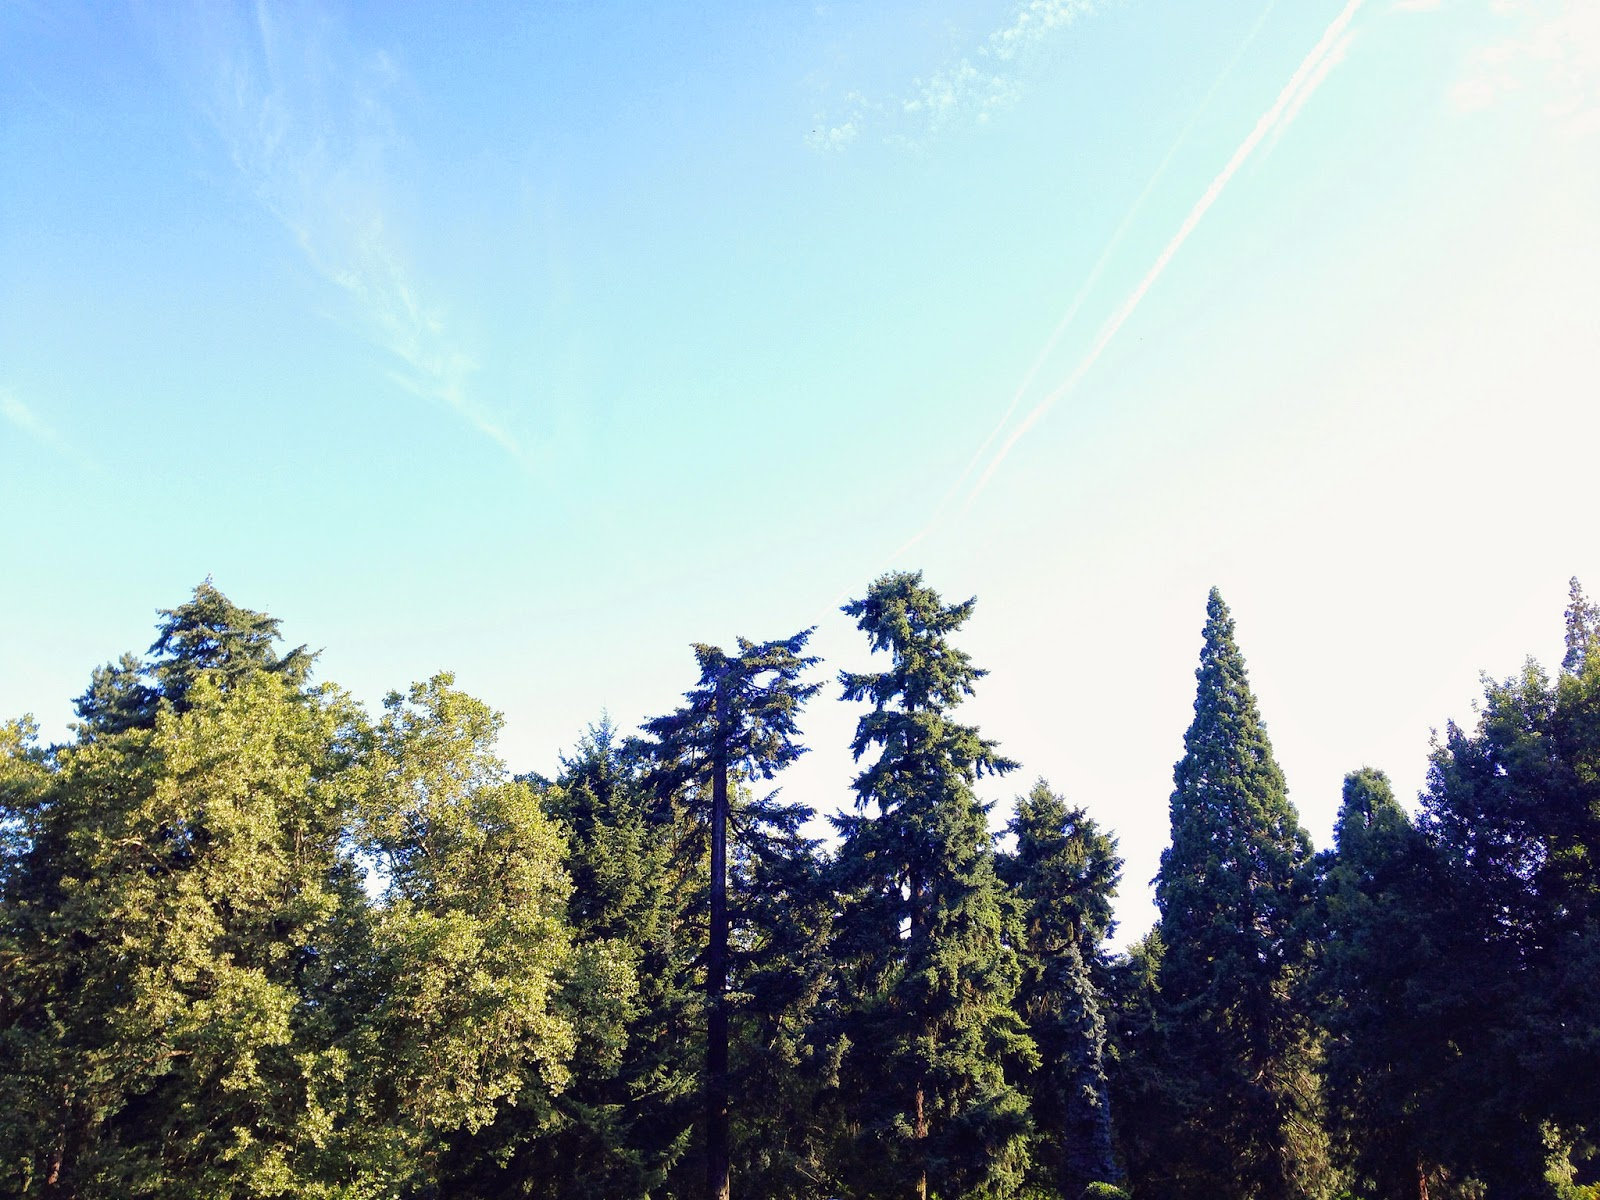 vegan road trip and camping throgh portland sisters north bend oregon seattle washington vancouver british colunmia canada